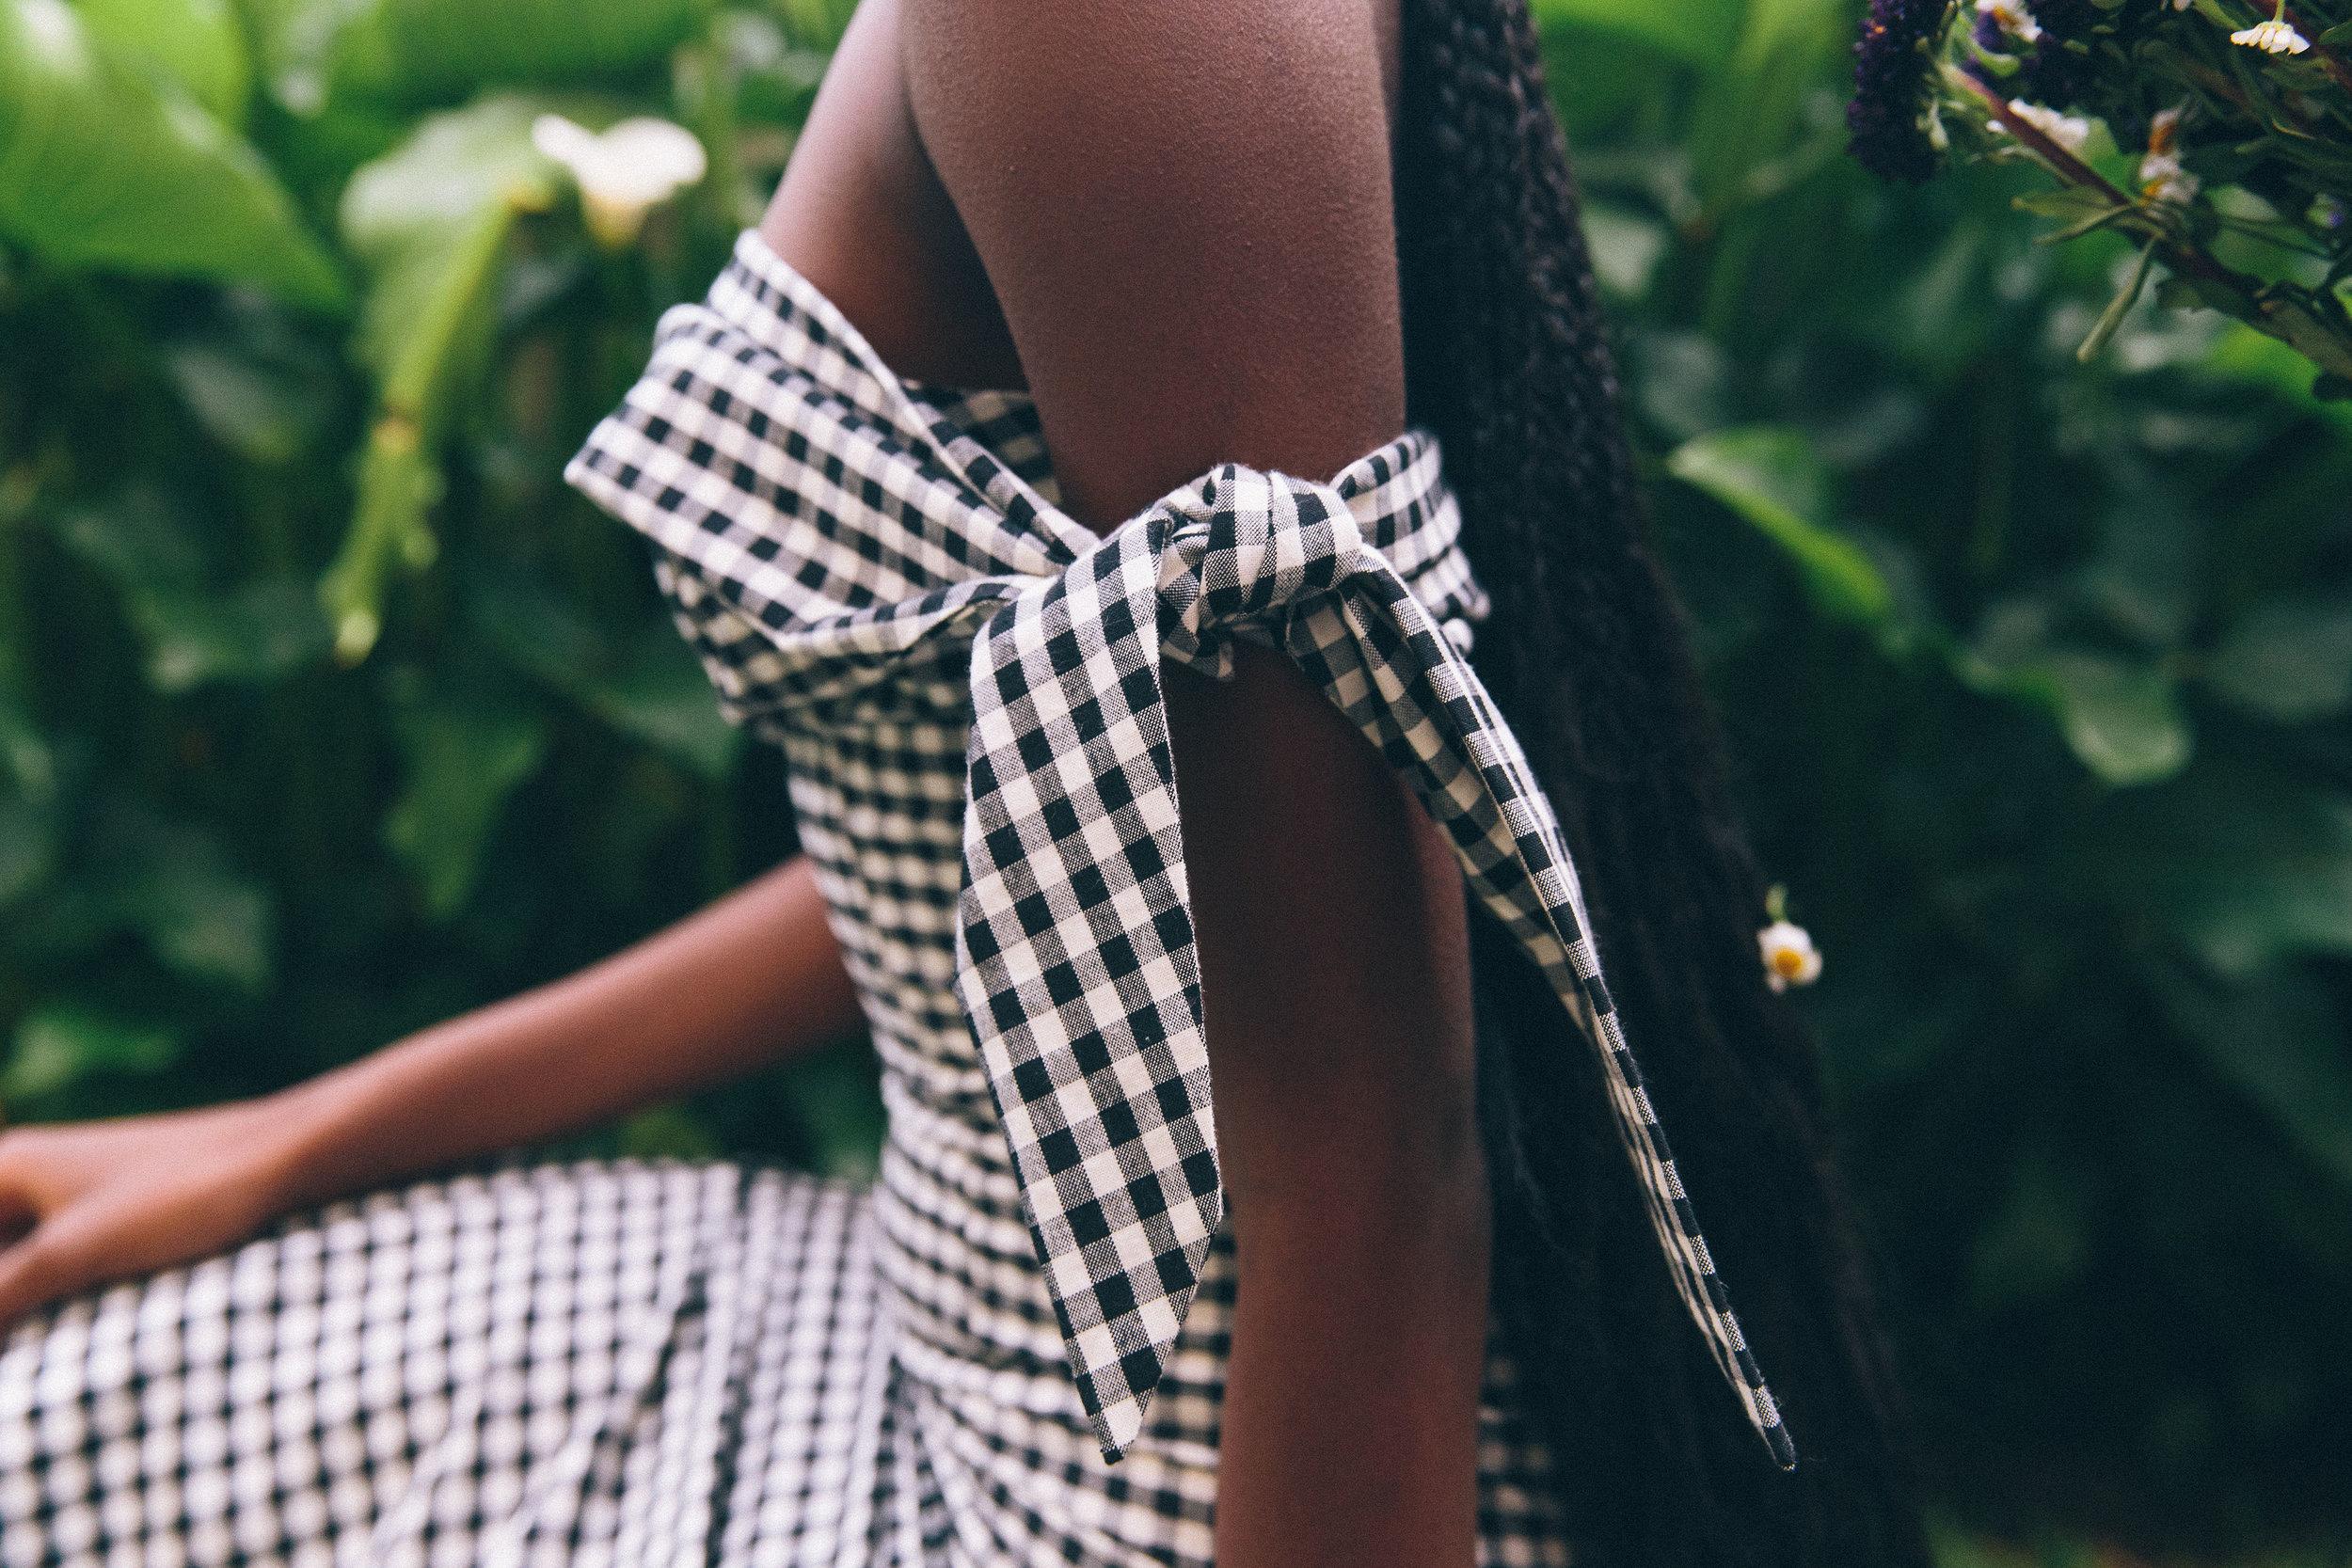 ellice ruiz_sustainable workwear_artsy girls.jpg